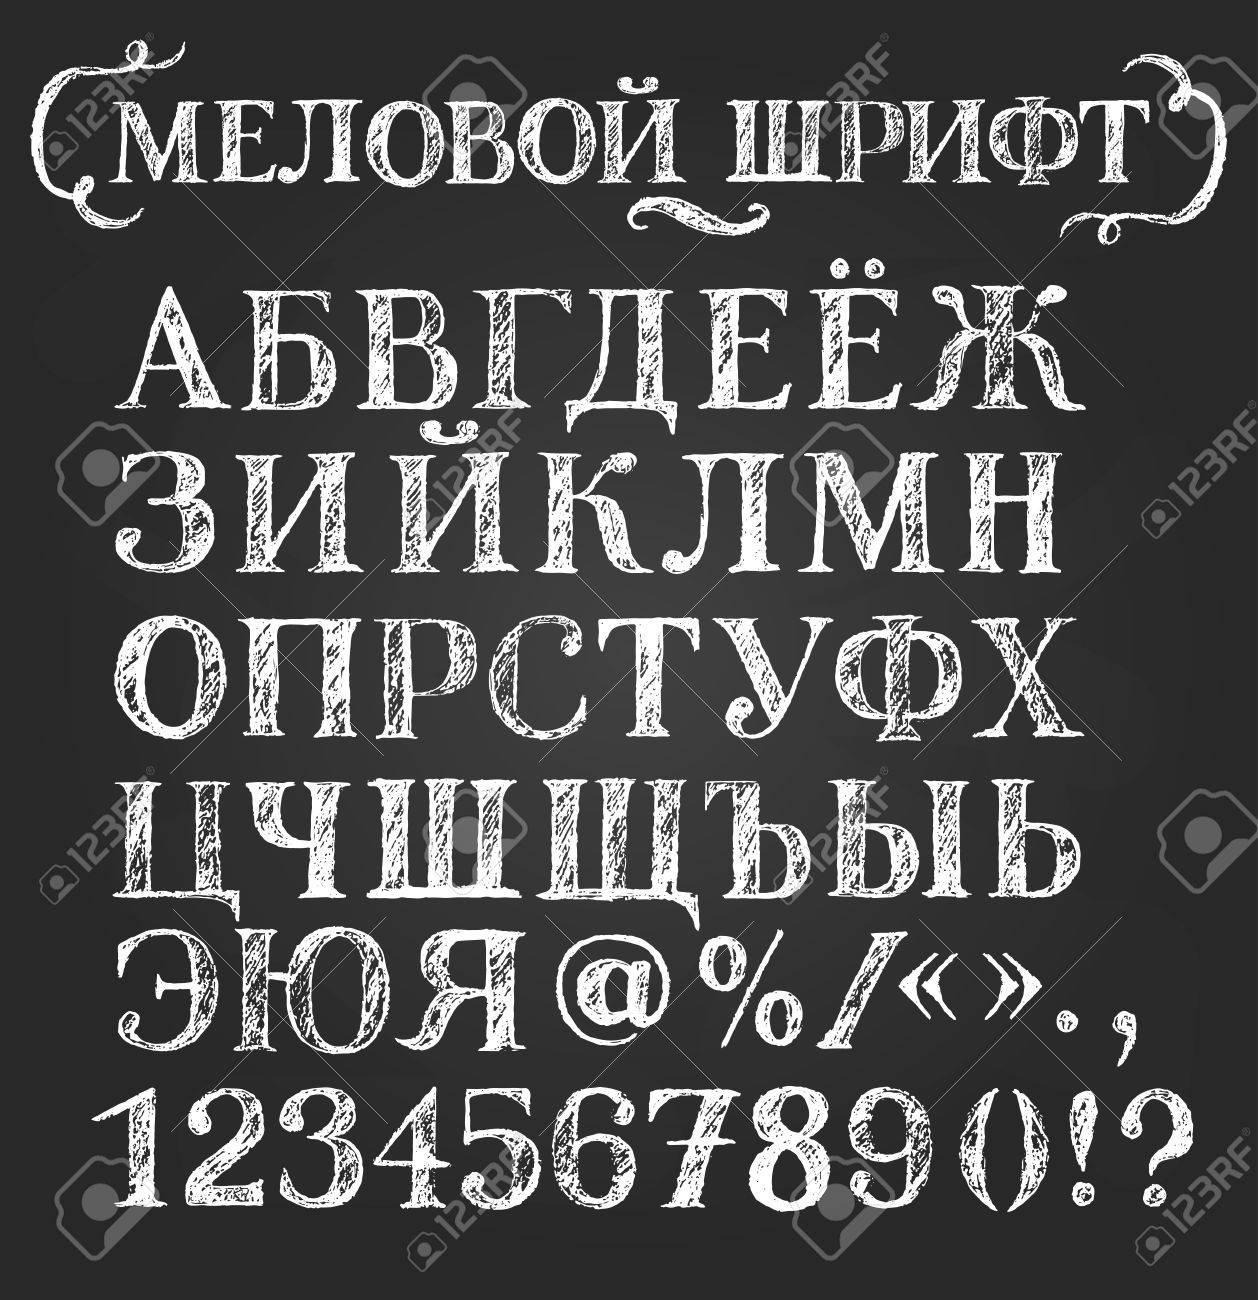 Chalk cyrillic font  Russian capital letters, special symbols